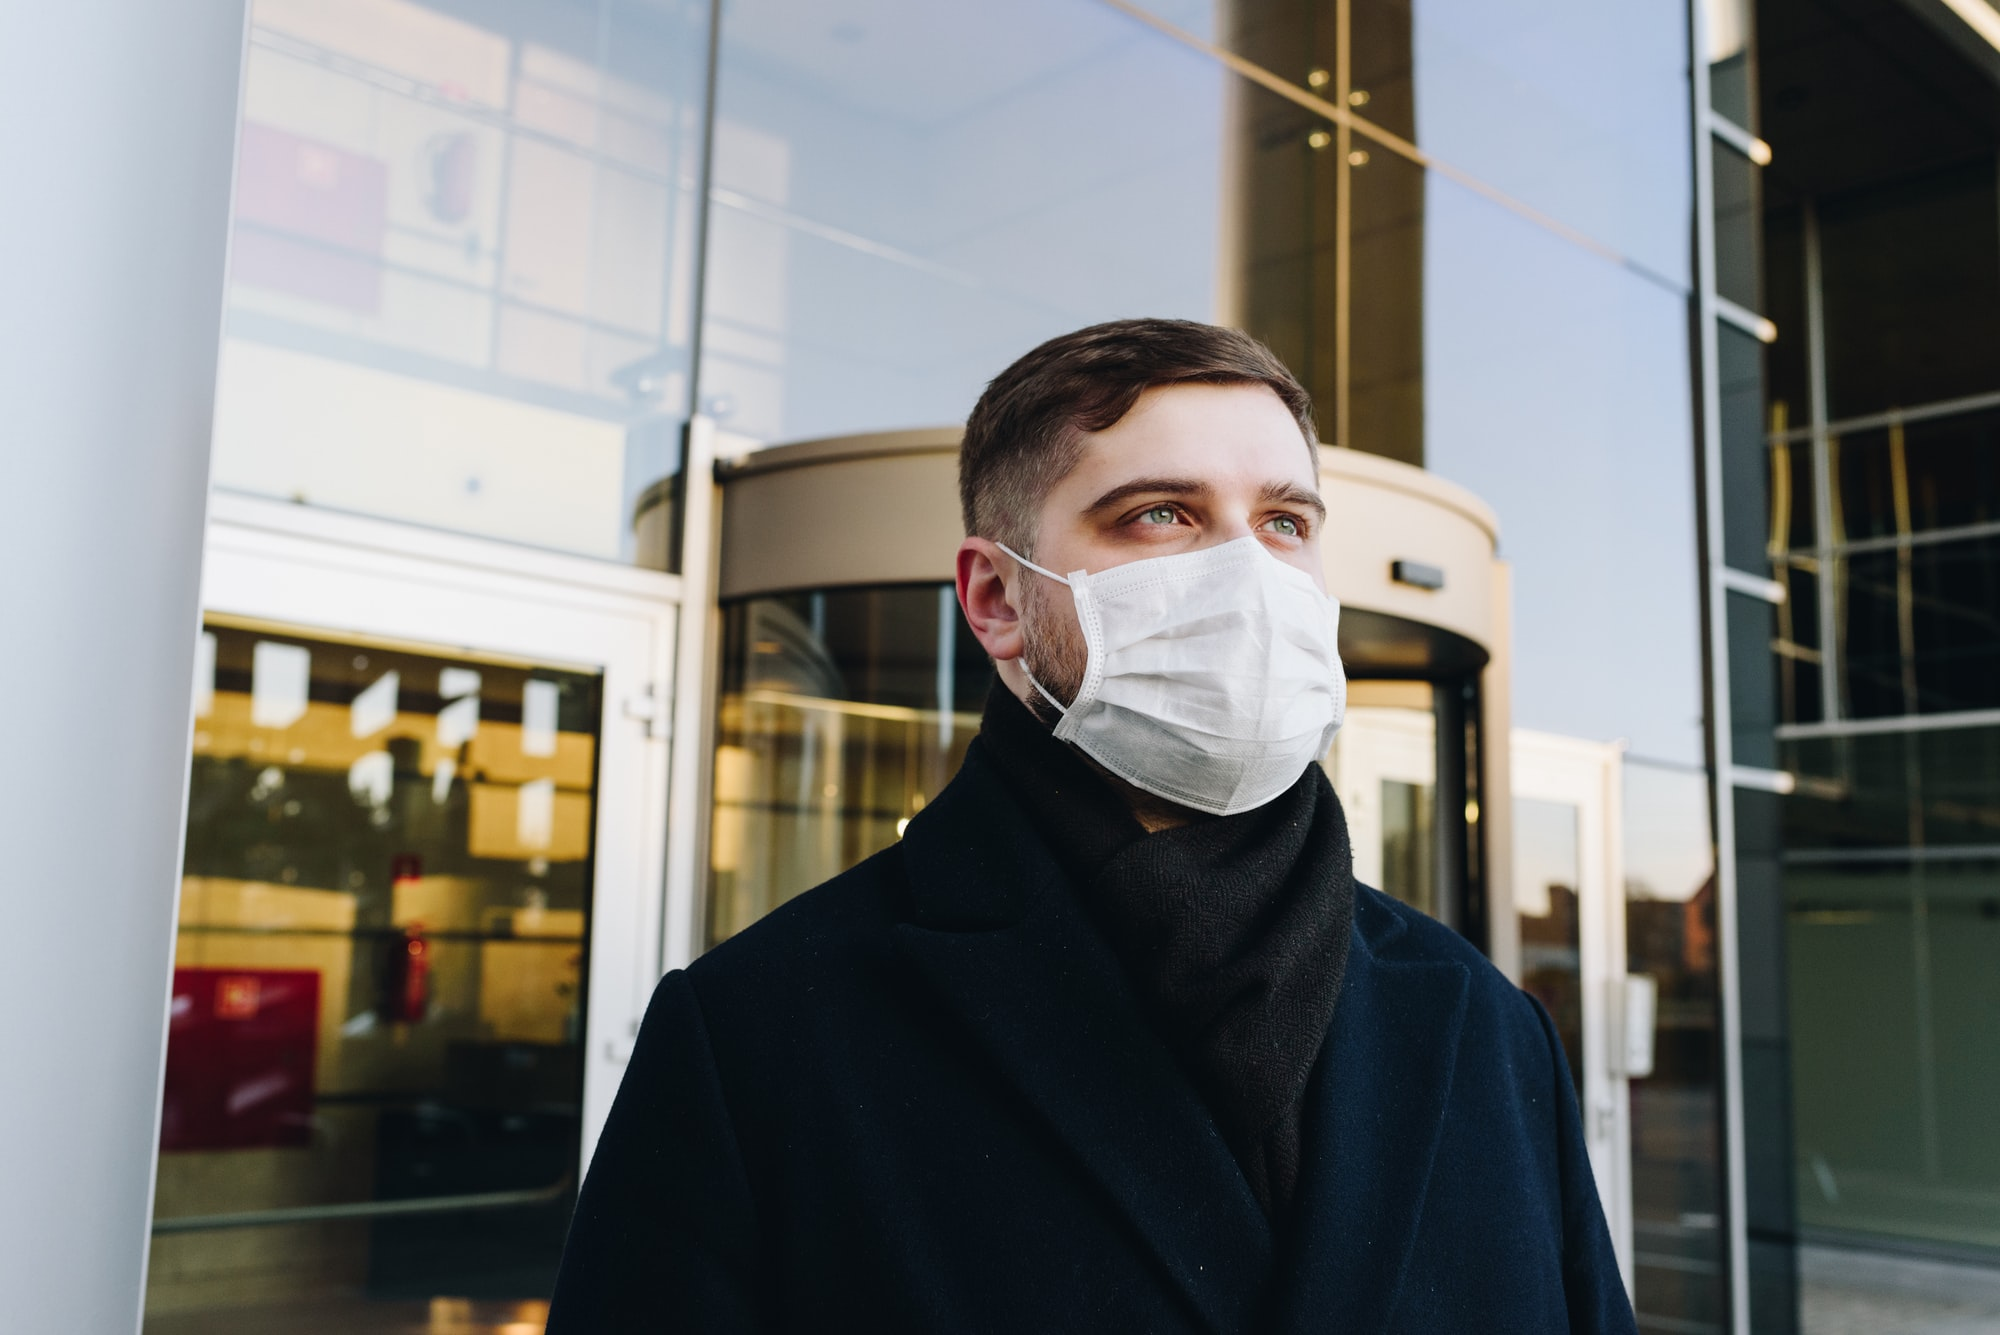 Live Blogging the Coronavirus Outbreak from Ashland, Oregon: Sending Love and Antibodies